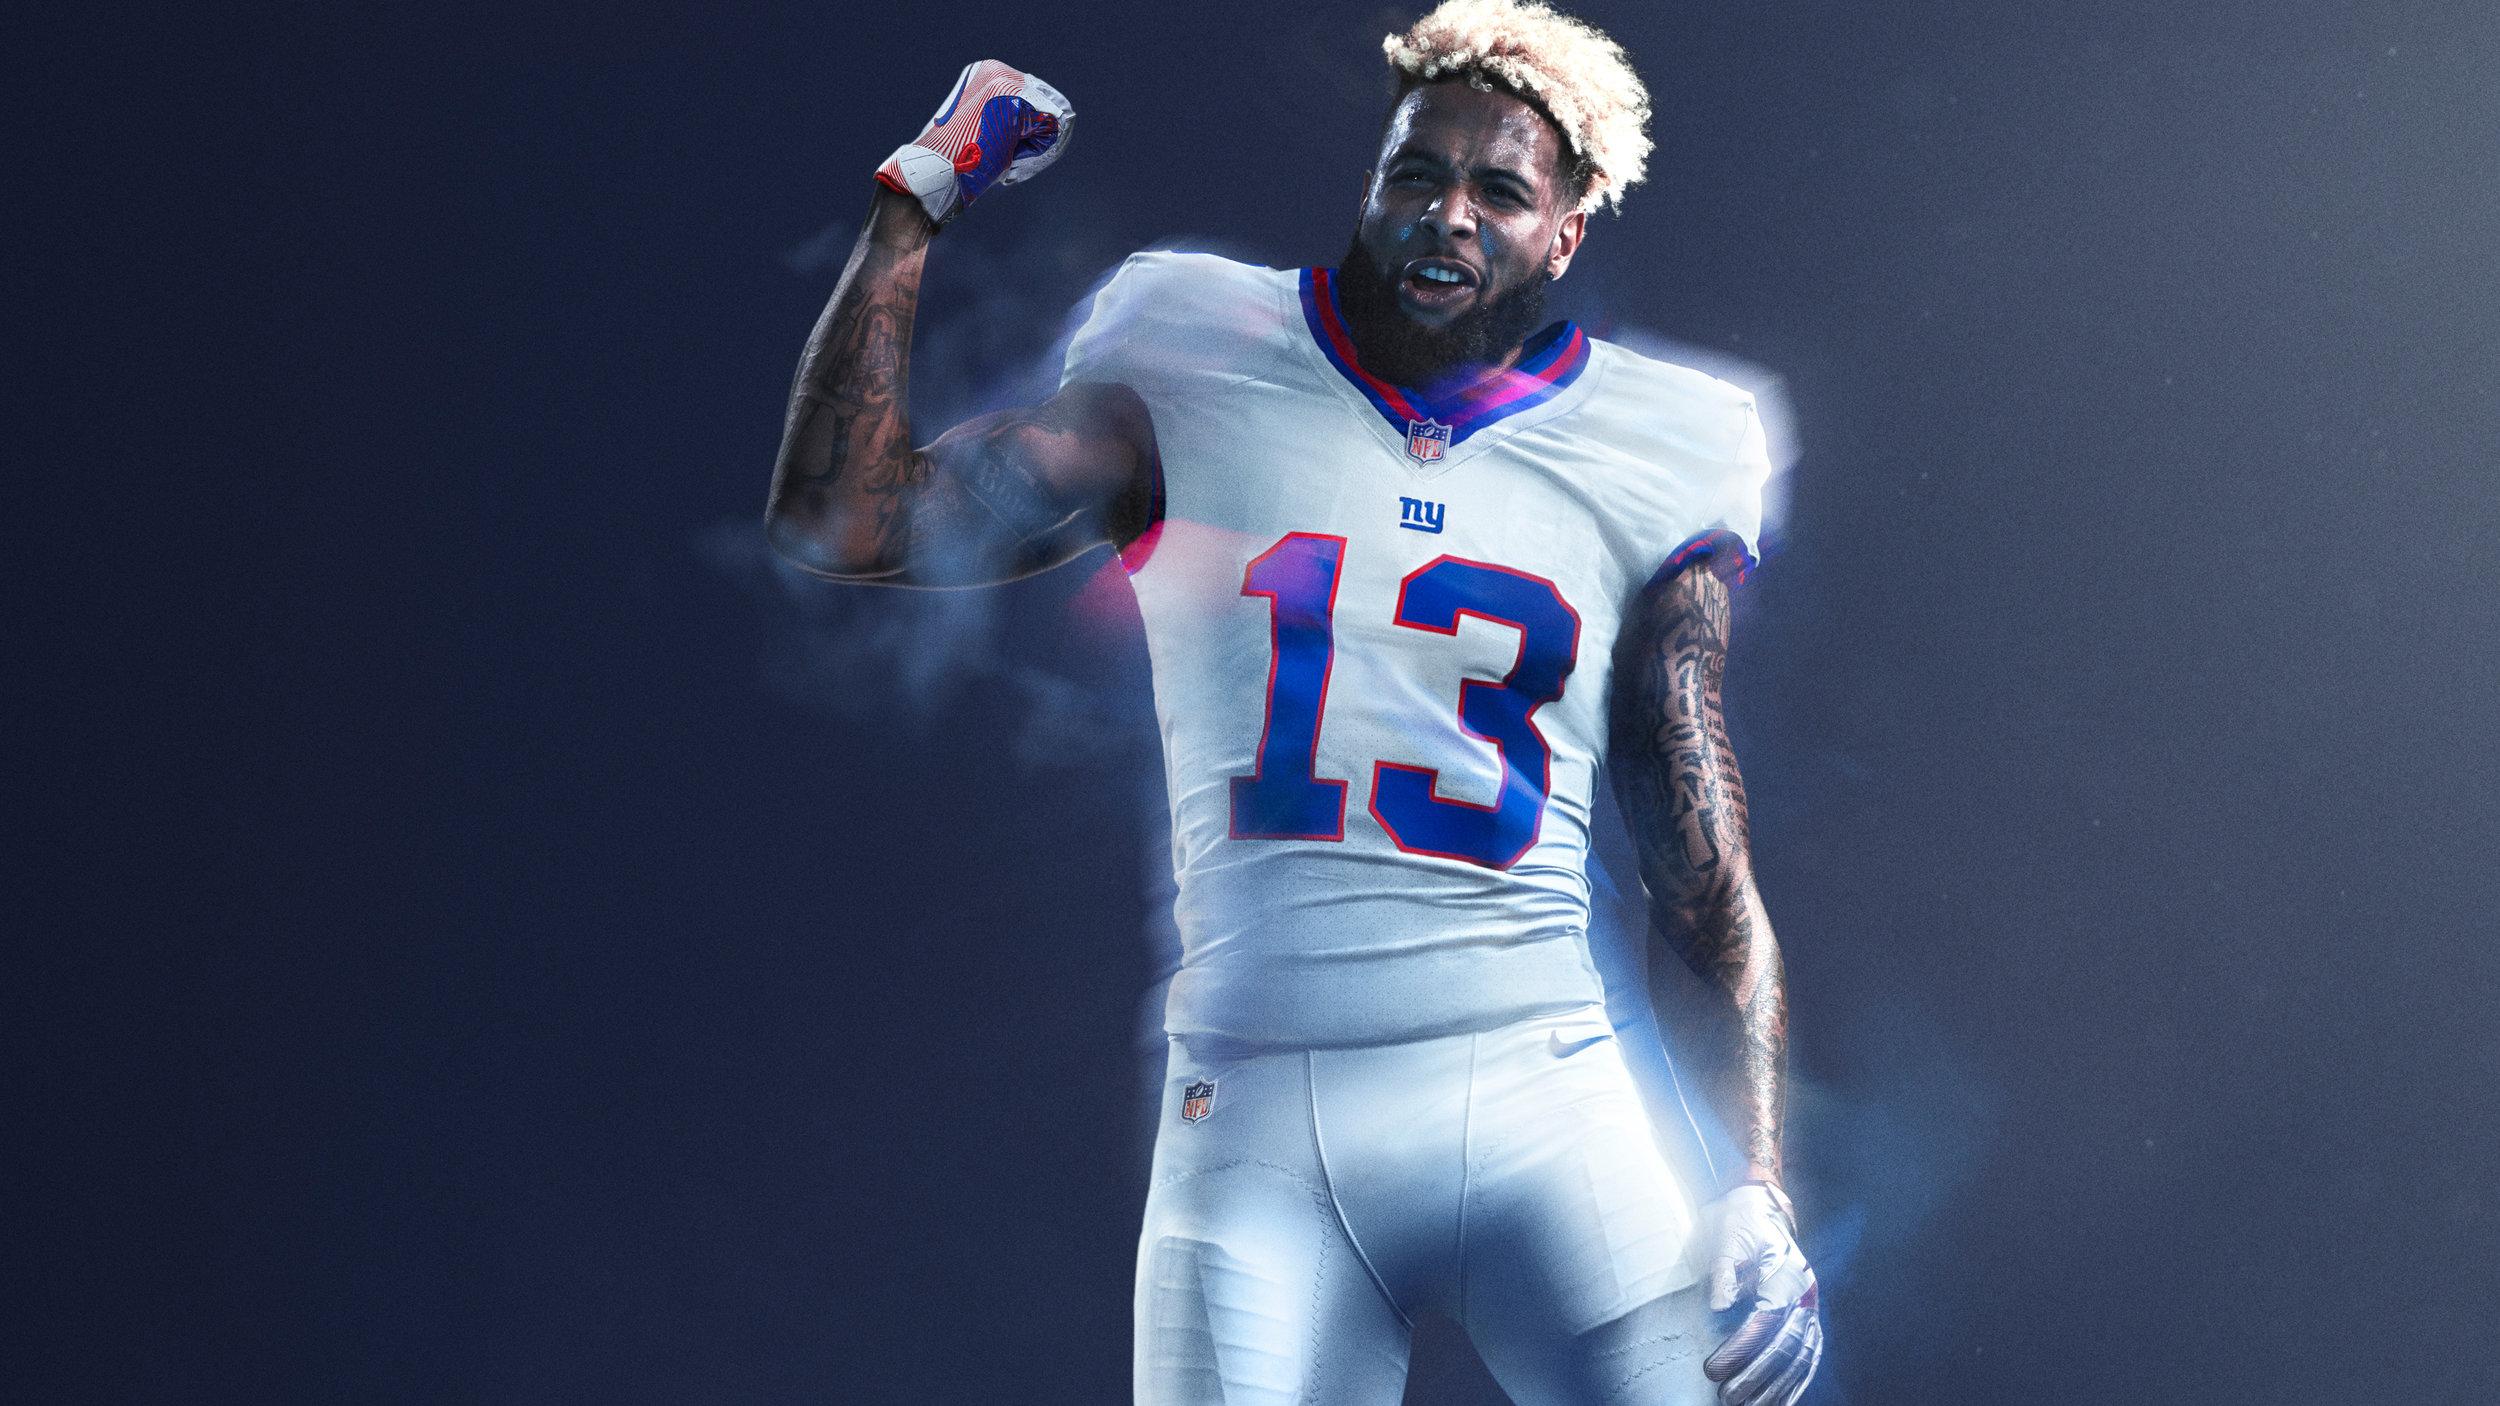 Nike-Football-NFL-Color-Rush-2016_OBeckham-2_62112.jpg